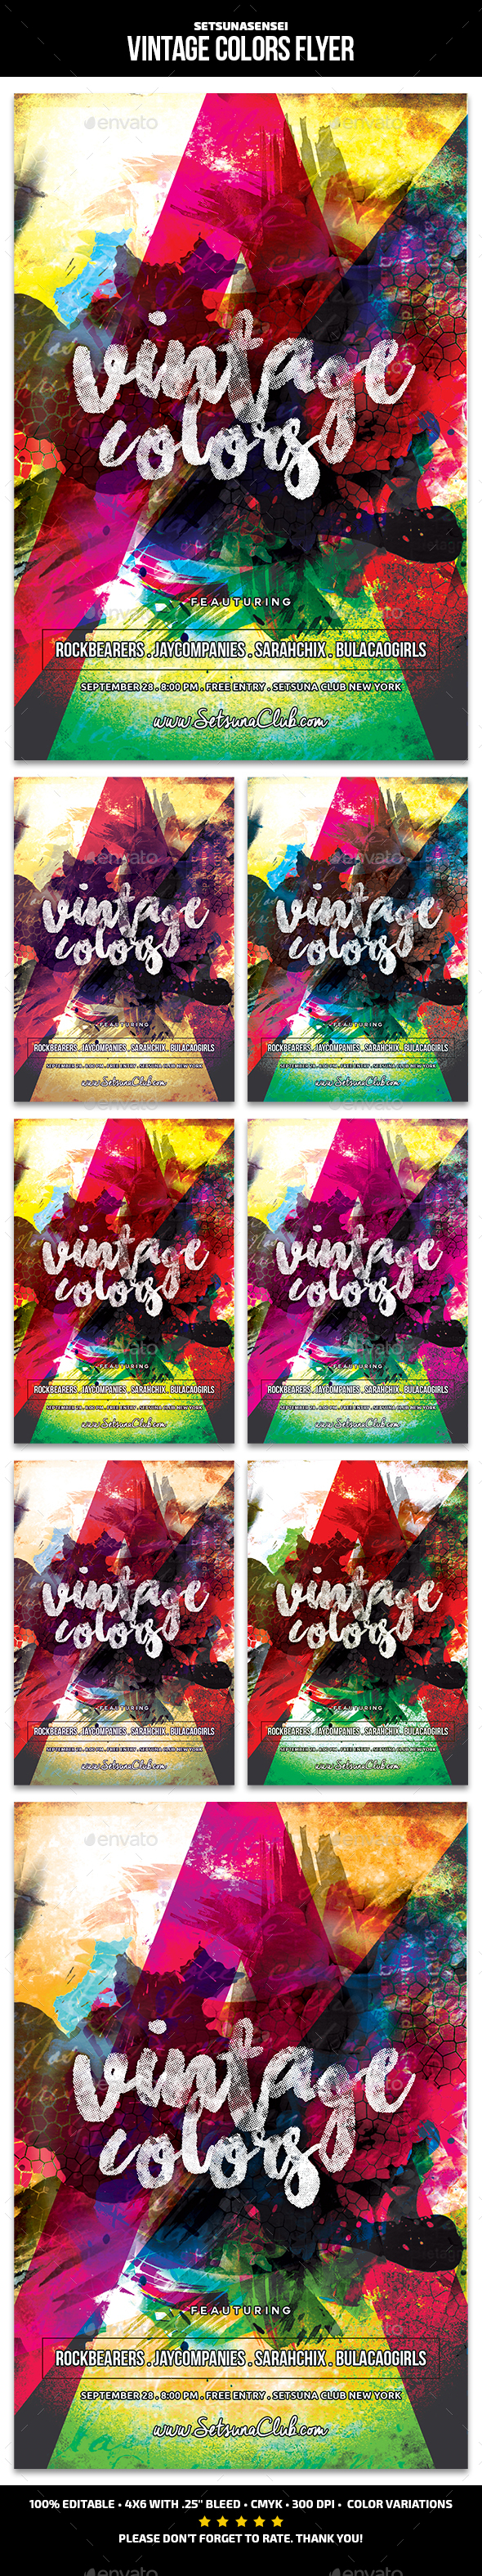 Vintage Colors Flyer - Clubs & Parties Events